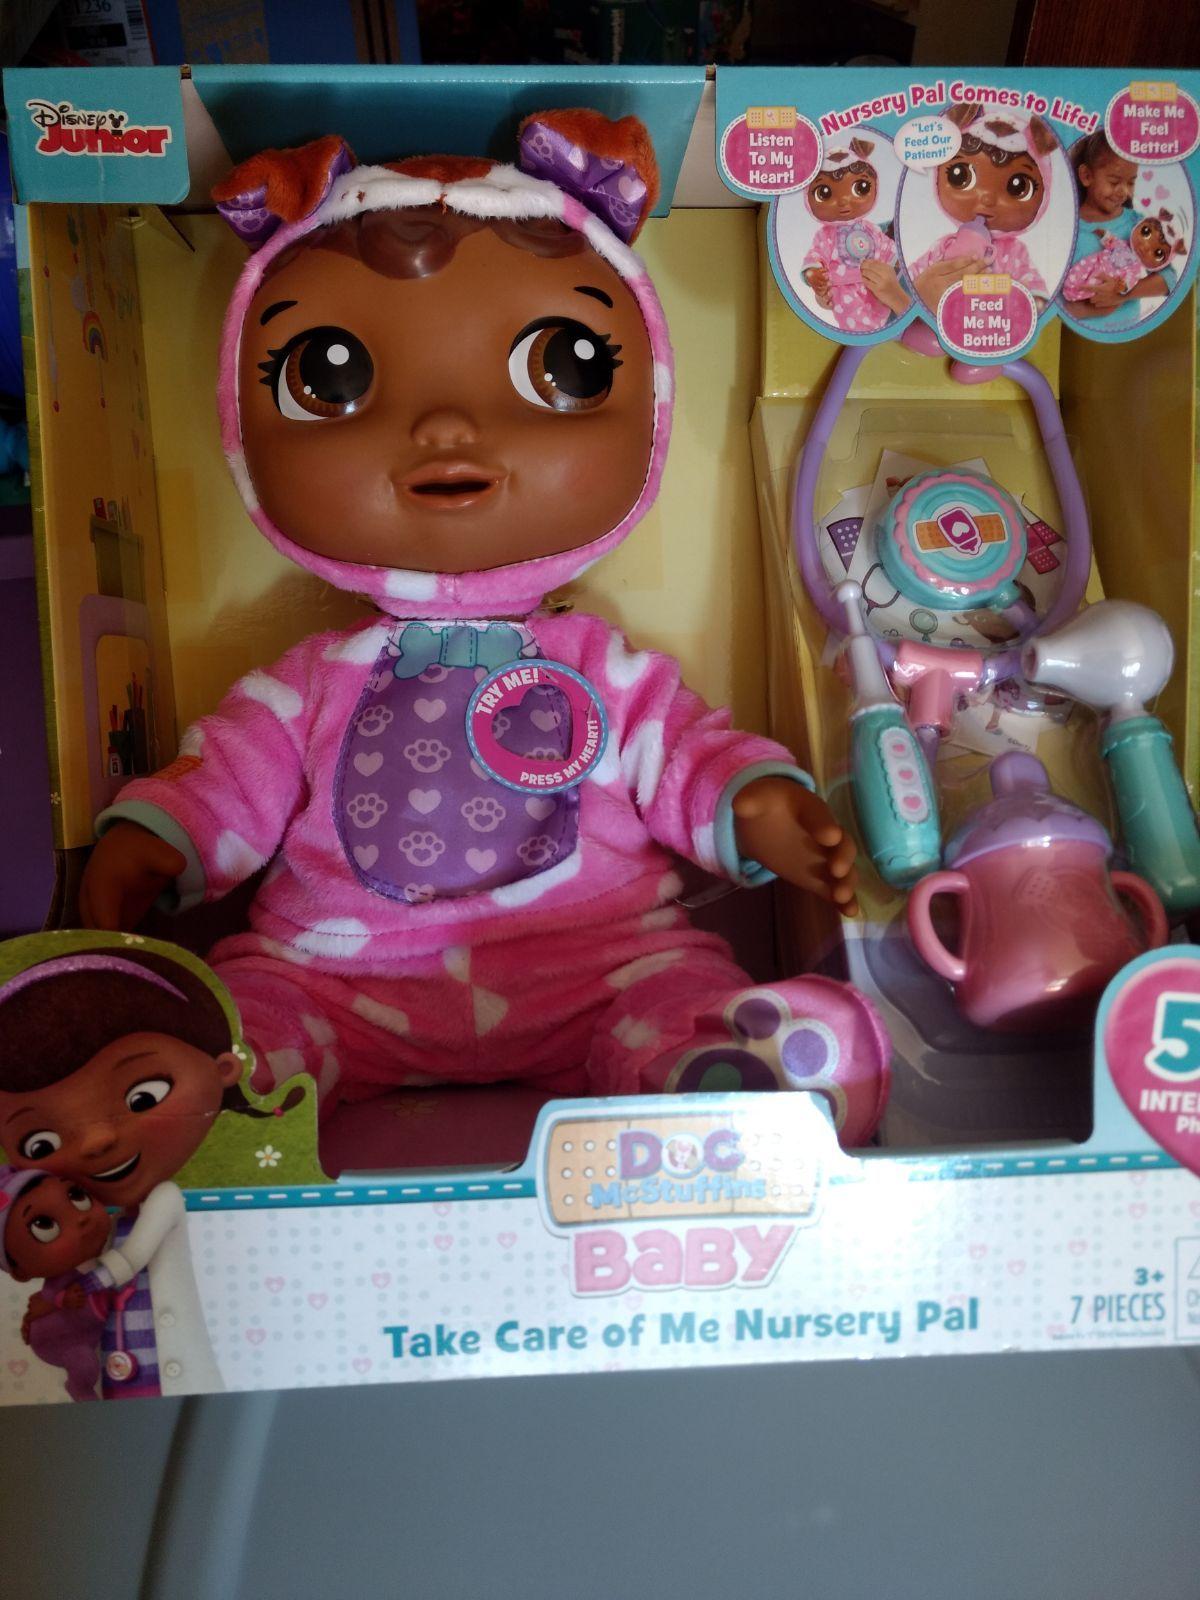 Disney Junior Doc Mcstuffins Baby Take Care Of Me Nursery Pal 50 Interactive Phrases Listen To My Heart Feed Me My Bottle Disney Dolls Disney Junior Disney